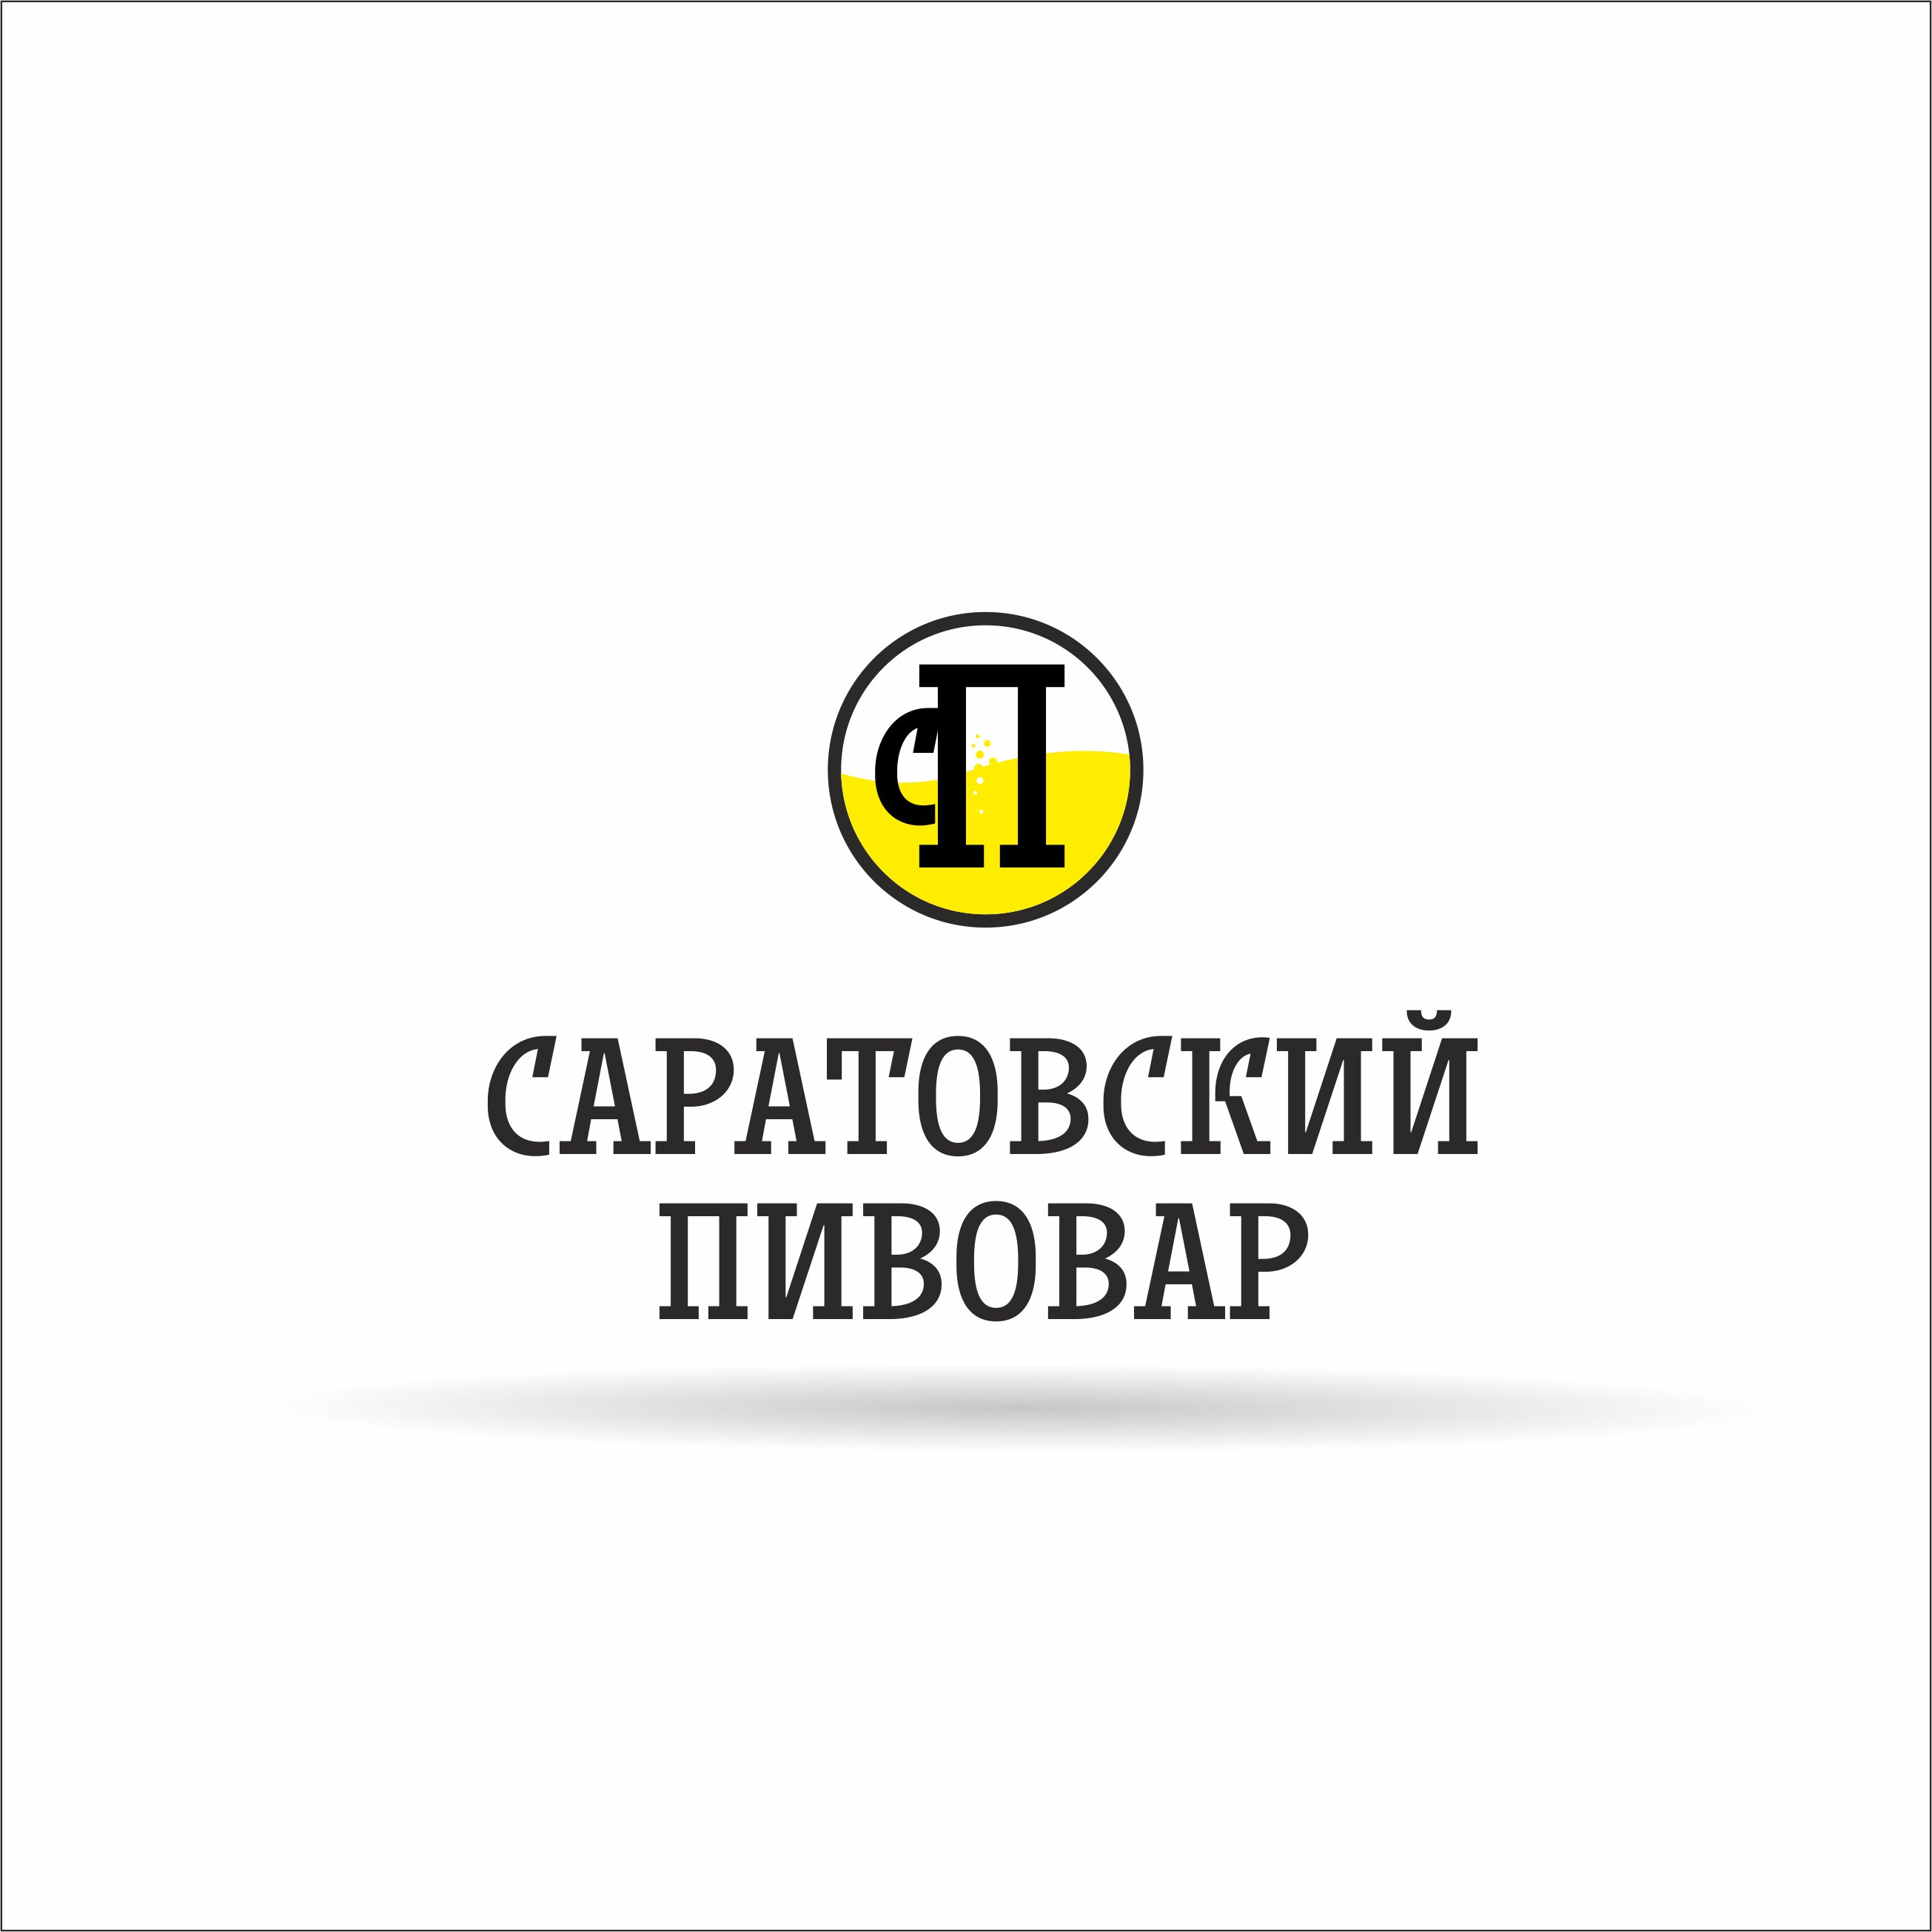 Разработка логотипа для частной пивоварни фото f_4295d7b71aae1dc9.jpg